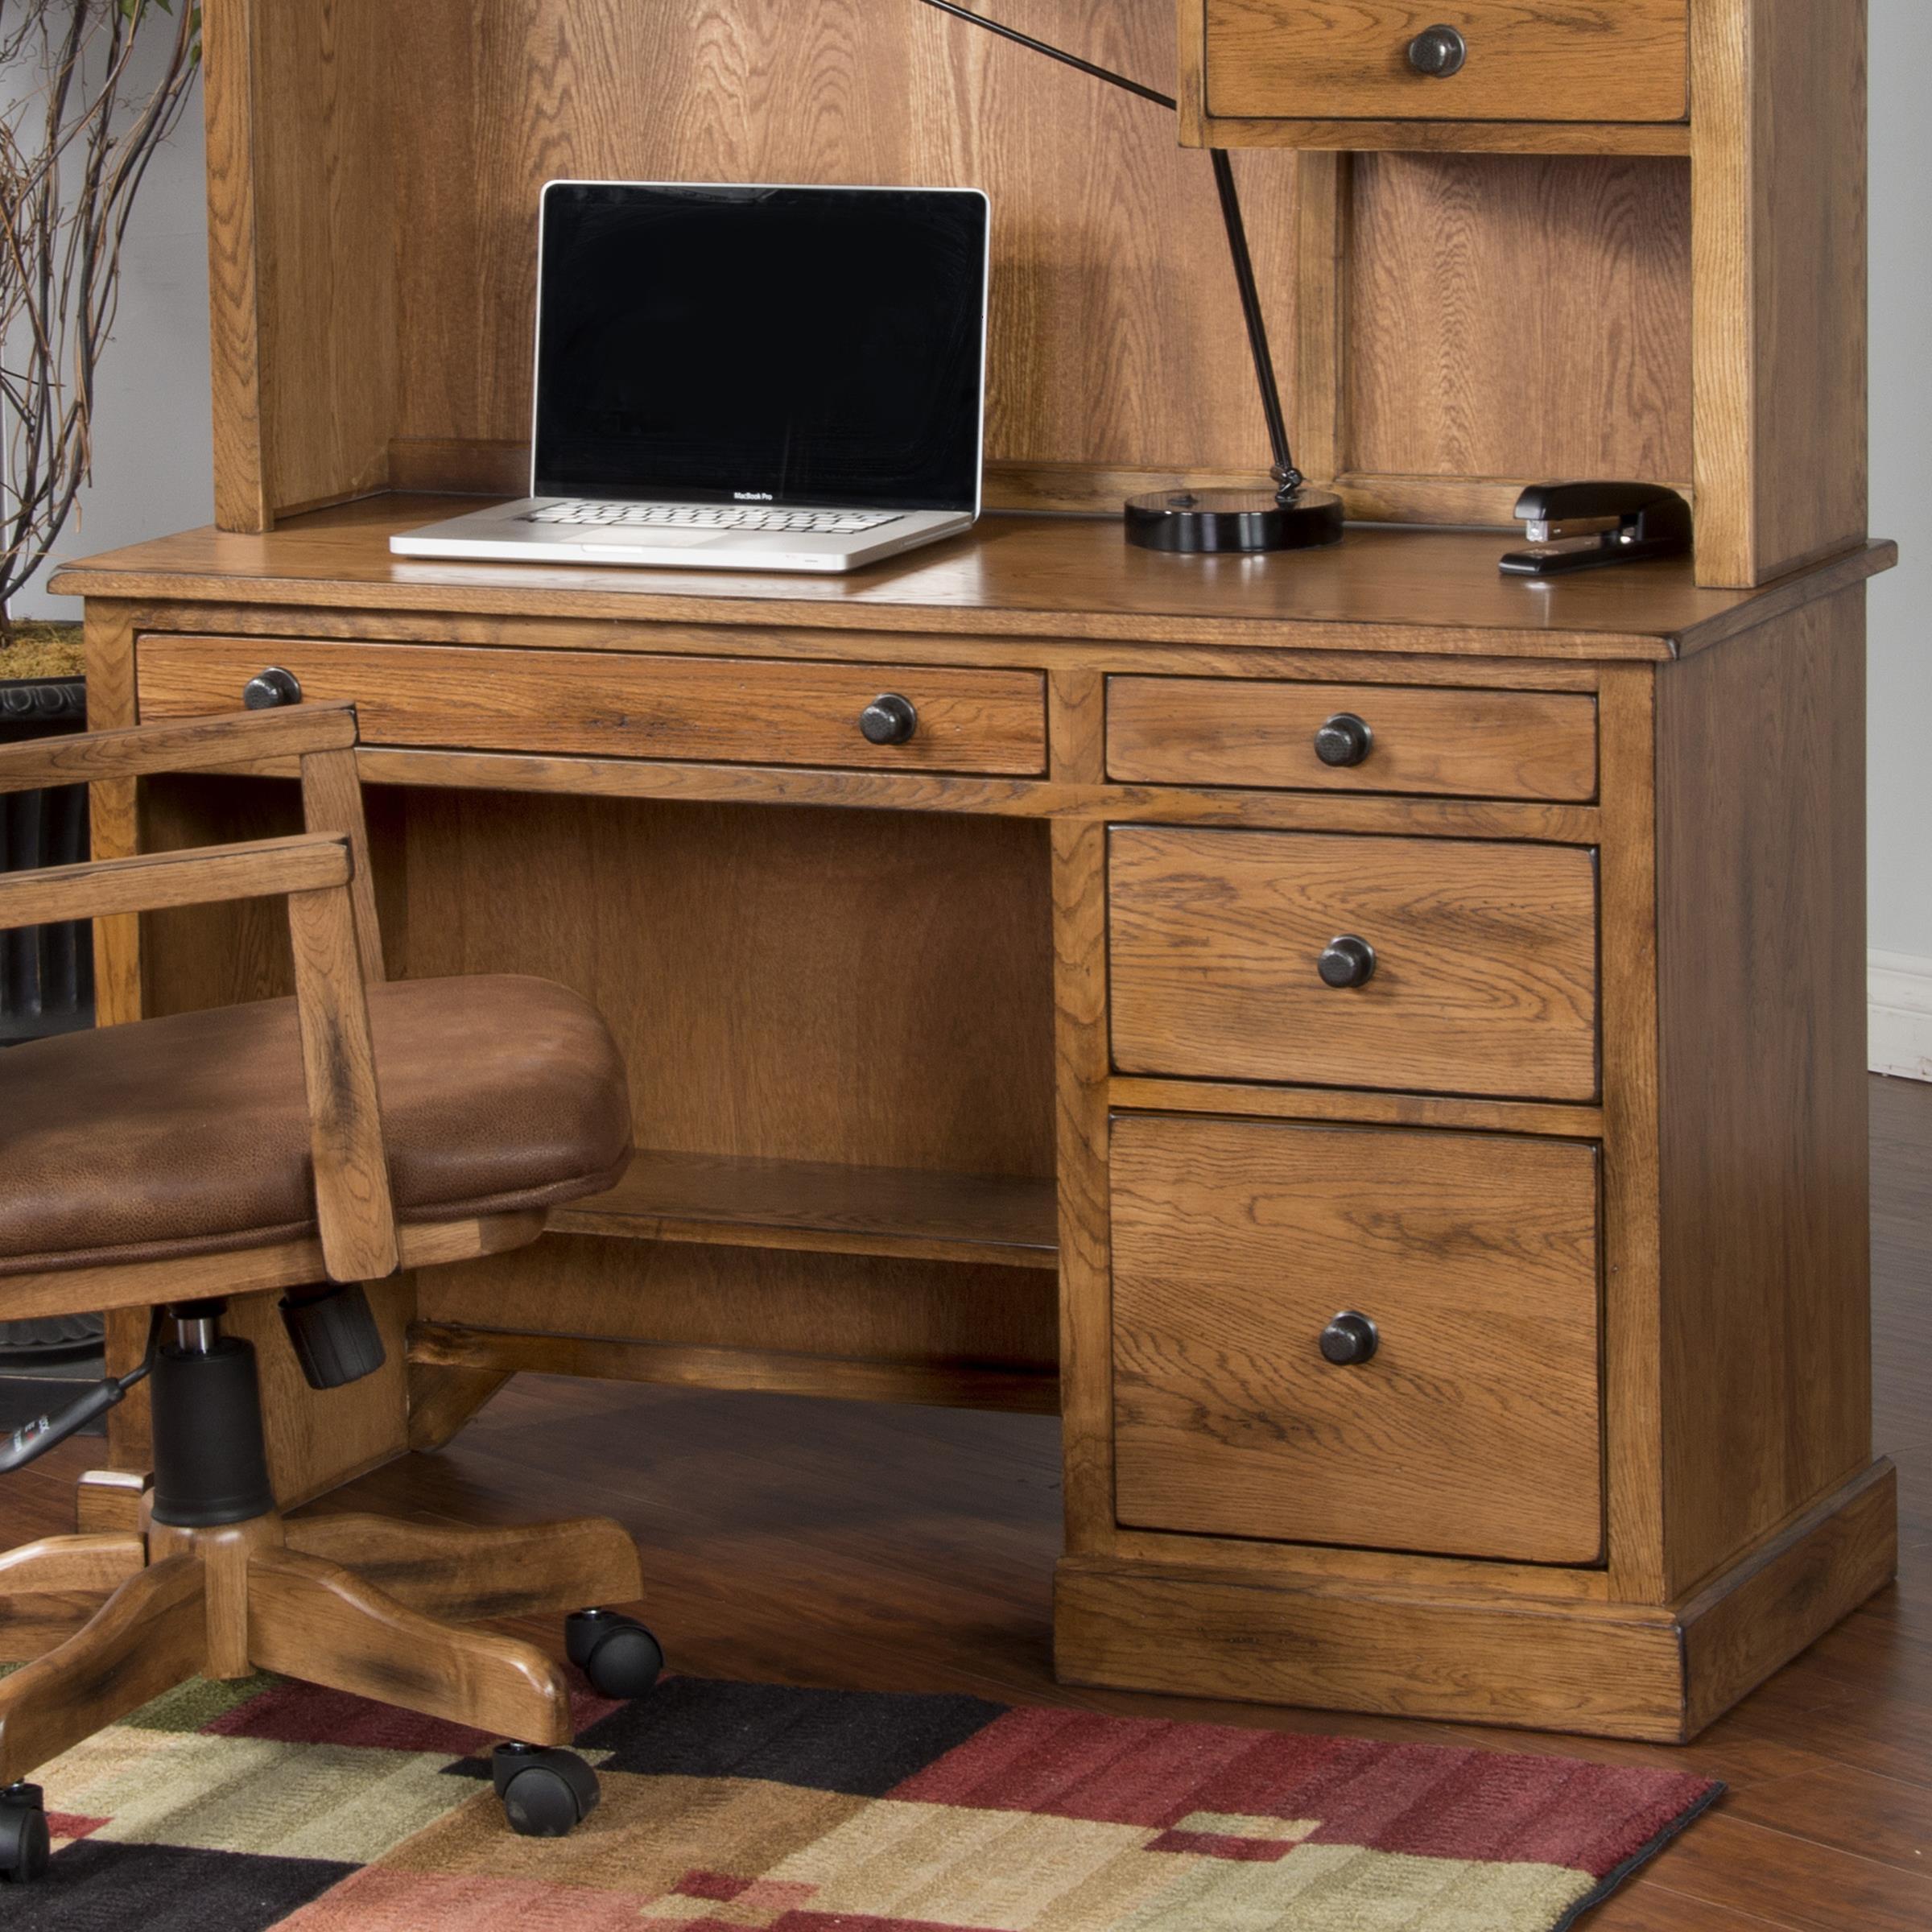 Sunny Designs Sedona Single Pedestal Desk - Item Number: 2968RO-D